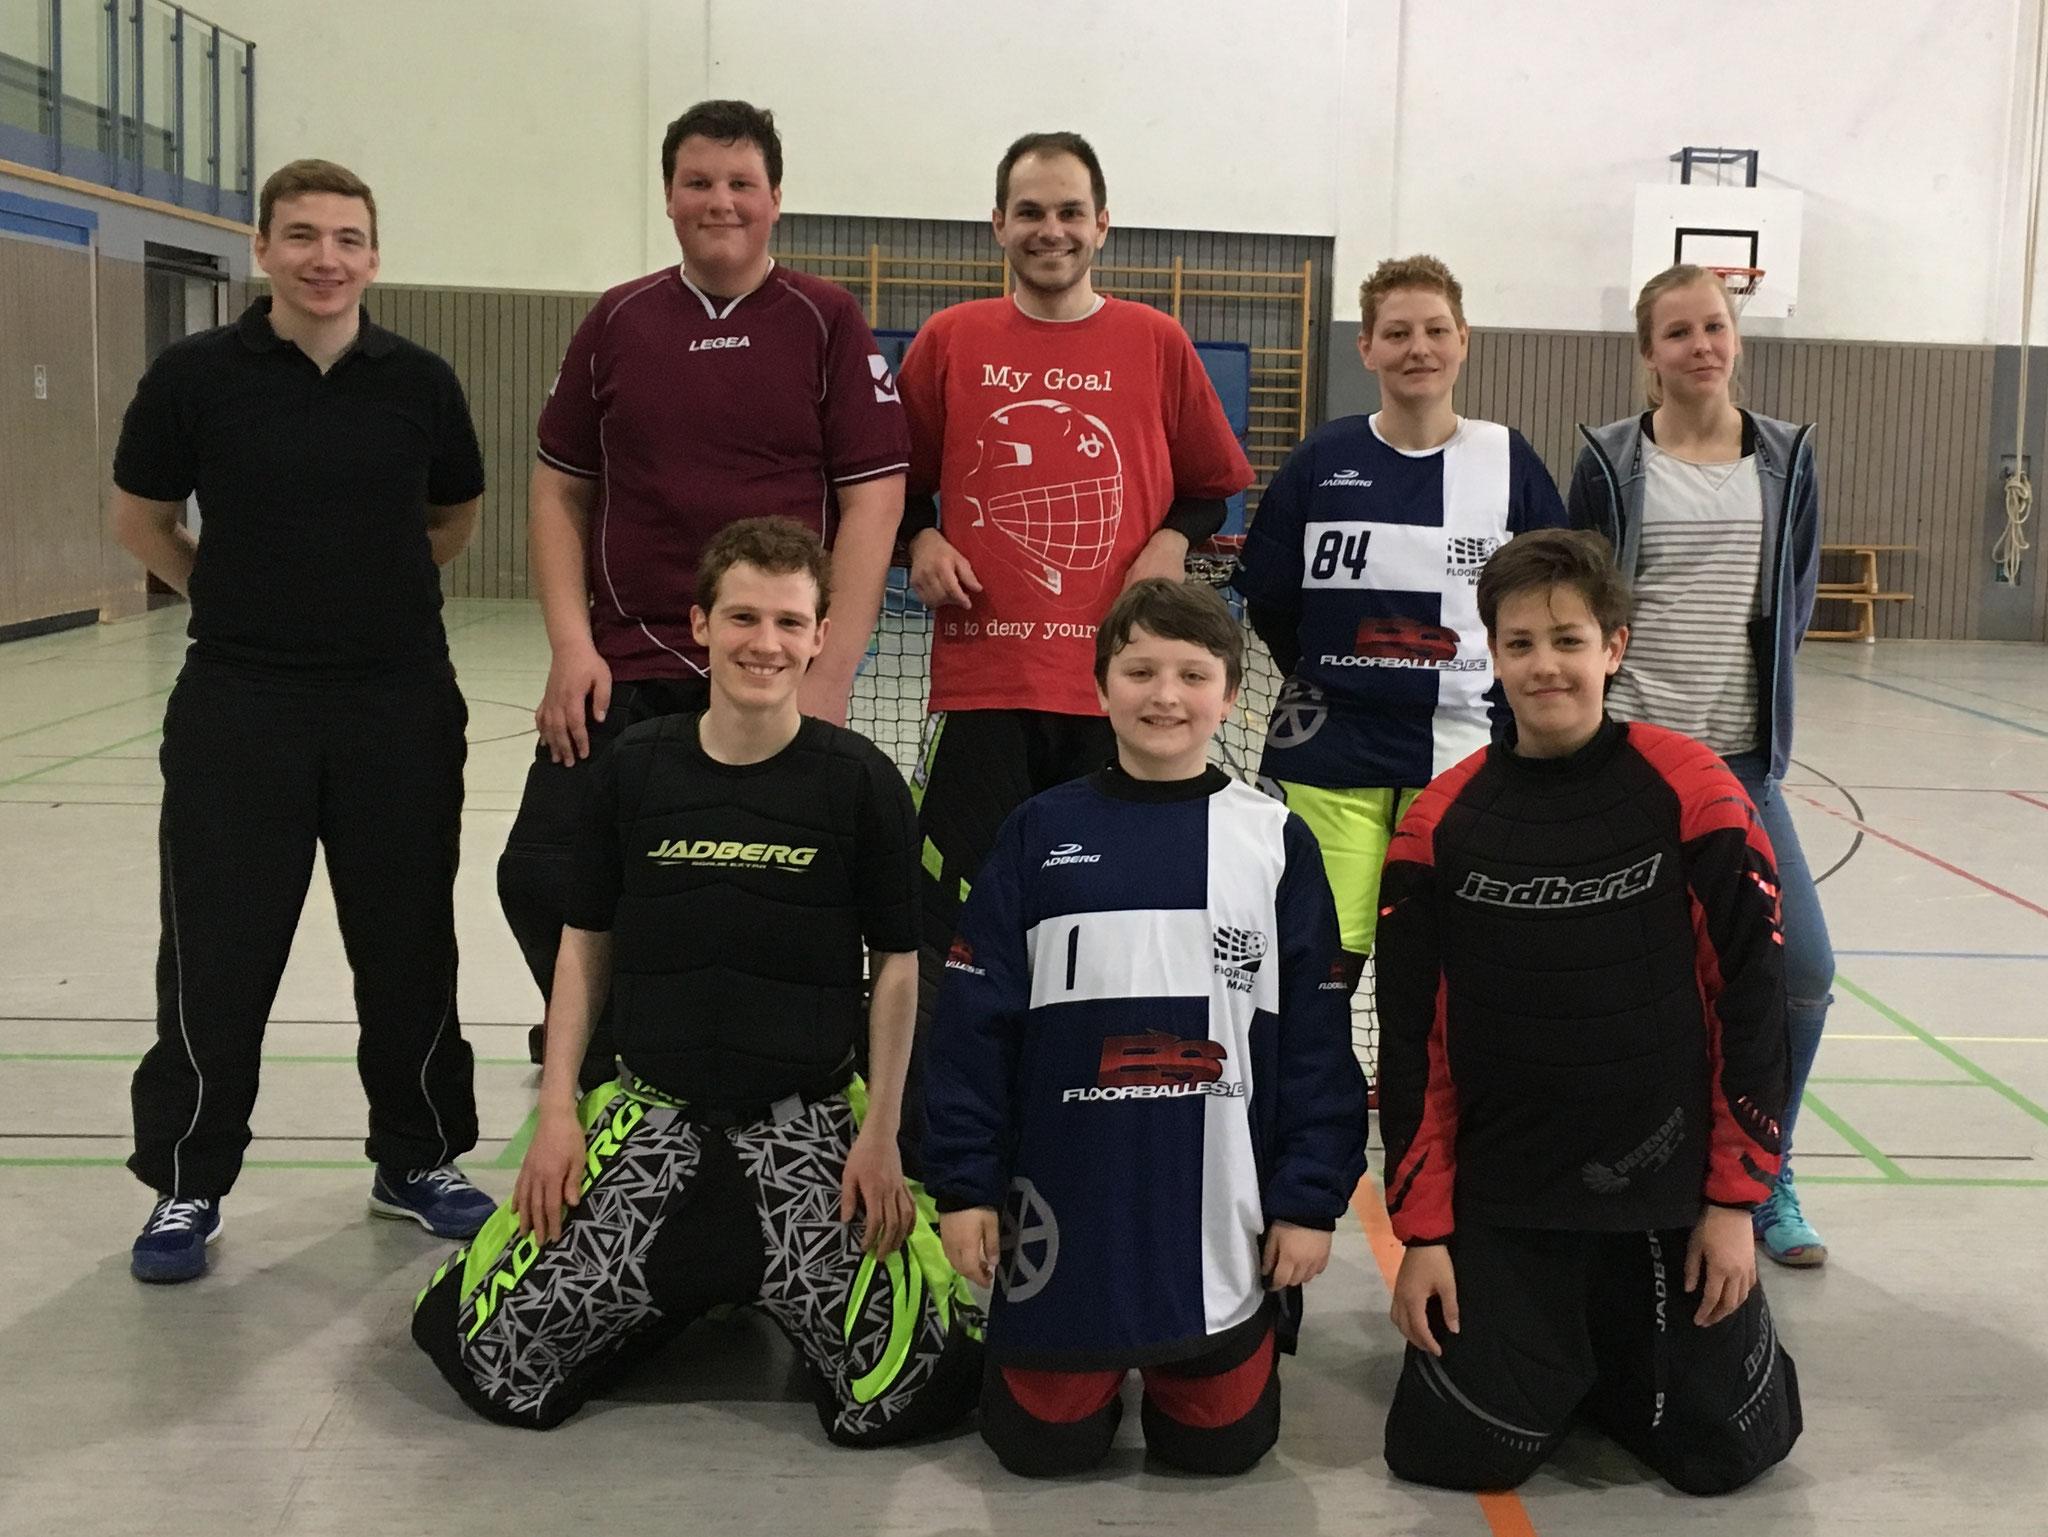 Hinten VLNR: Fabian Mieloch (Trainer), Tobias Braun (U17), Sebastian Zender (Herren), Anja Burkhadrt (Damen), Juliane Schwinck (Co-Trainer); Vorne VLNR: Carl Bürkel (FBC Heidelberg), Vincen Jahn (U13), Till Standtke (U13)